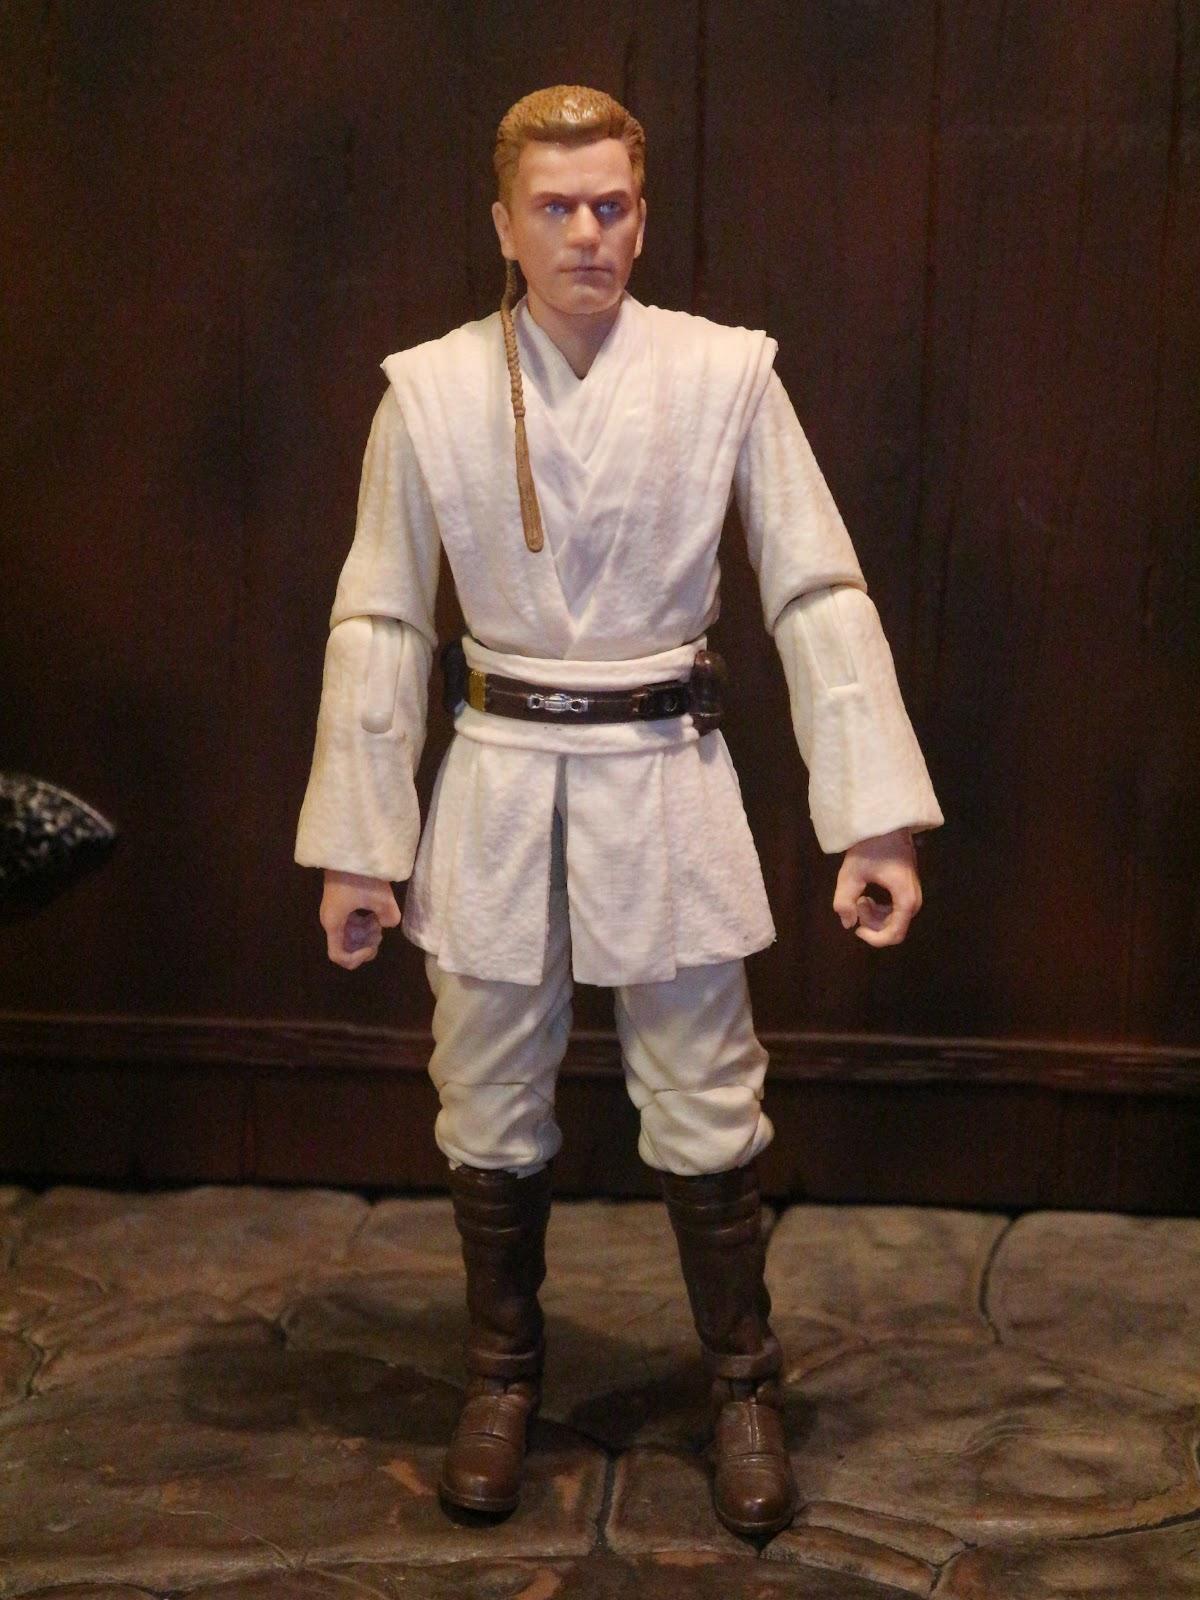 New! Hasbro Star Wars Episode 1 Obi-Wan Kenobi Jedi Duel Action Figure